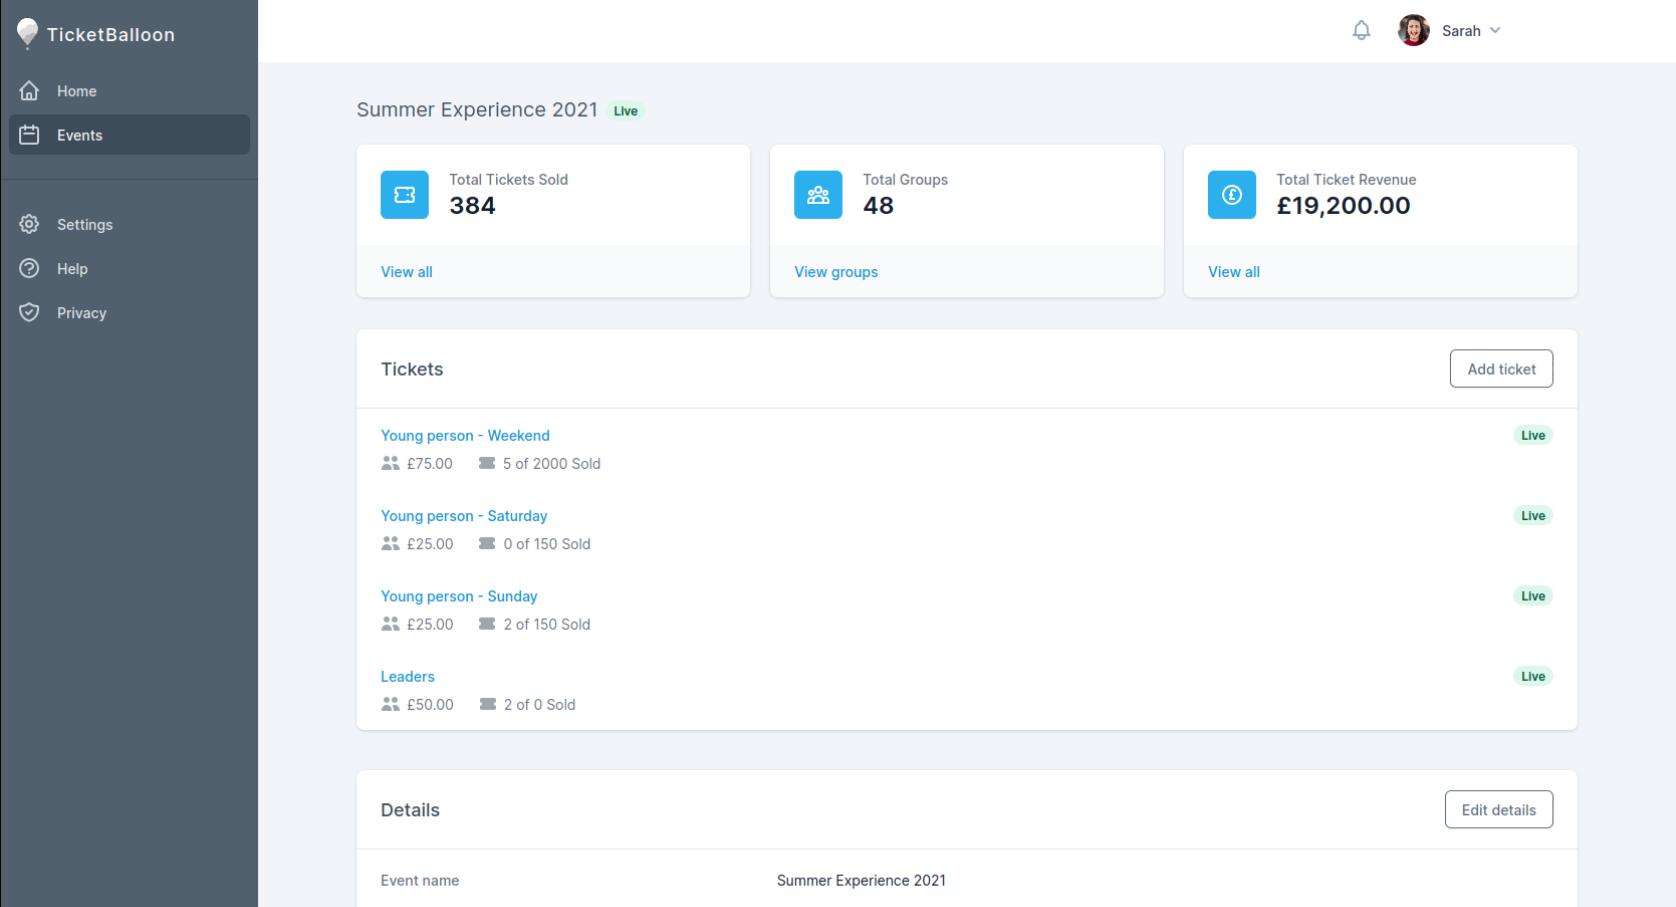 Screenshot of the TicketBalloon dashboard